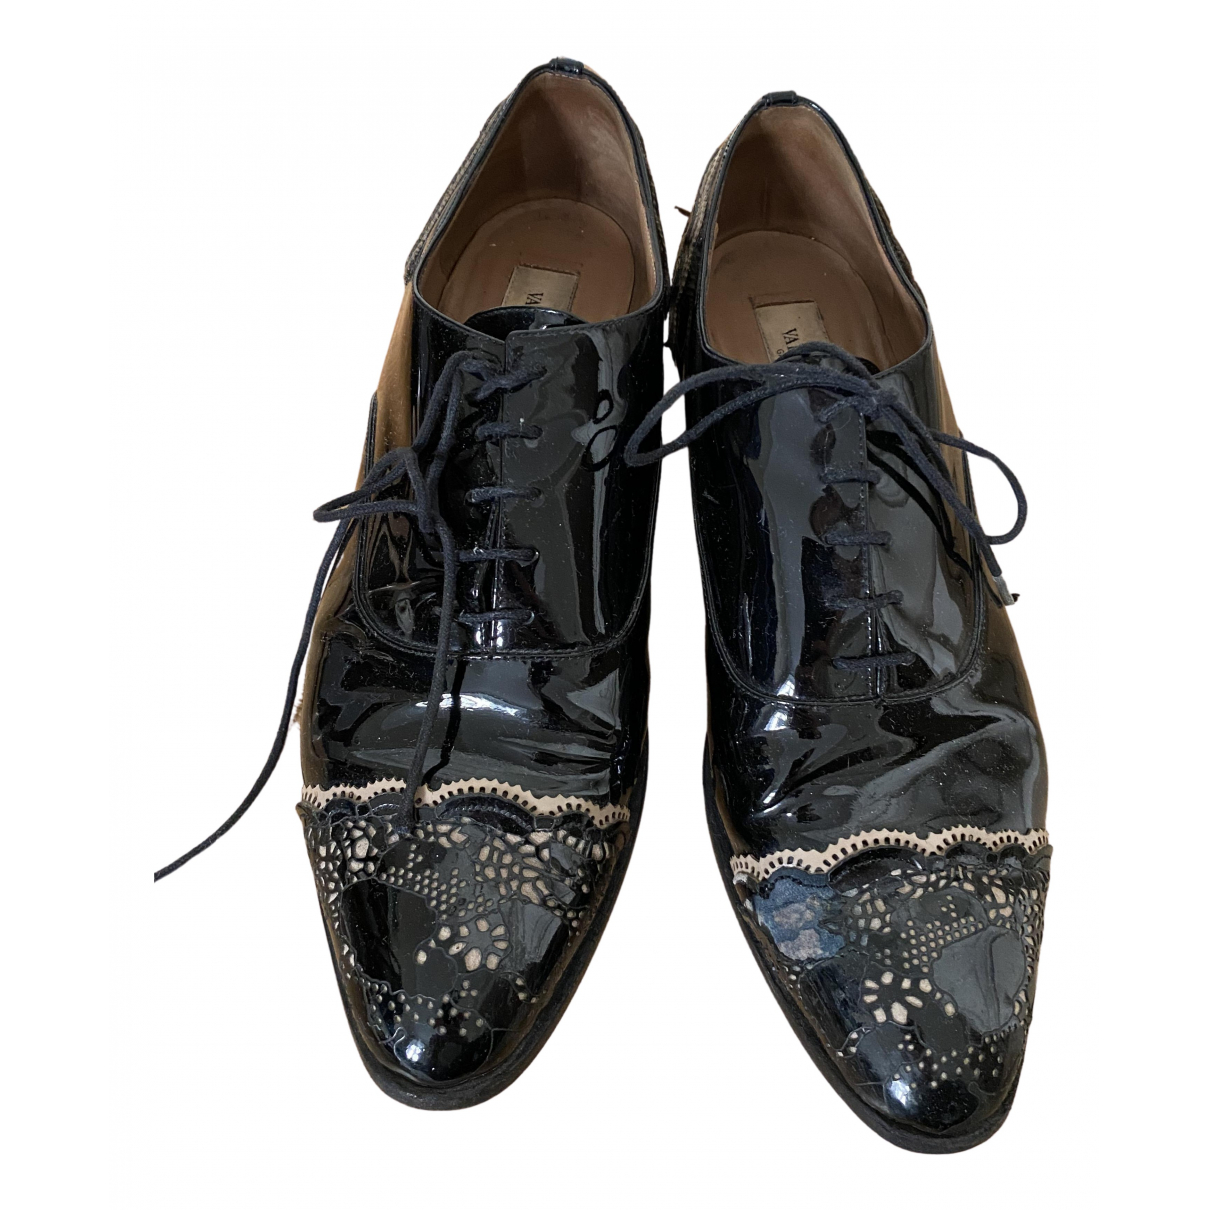 Valentino Garavani N Black Patent leather Lace ups for Women 39.5 EU